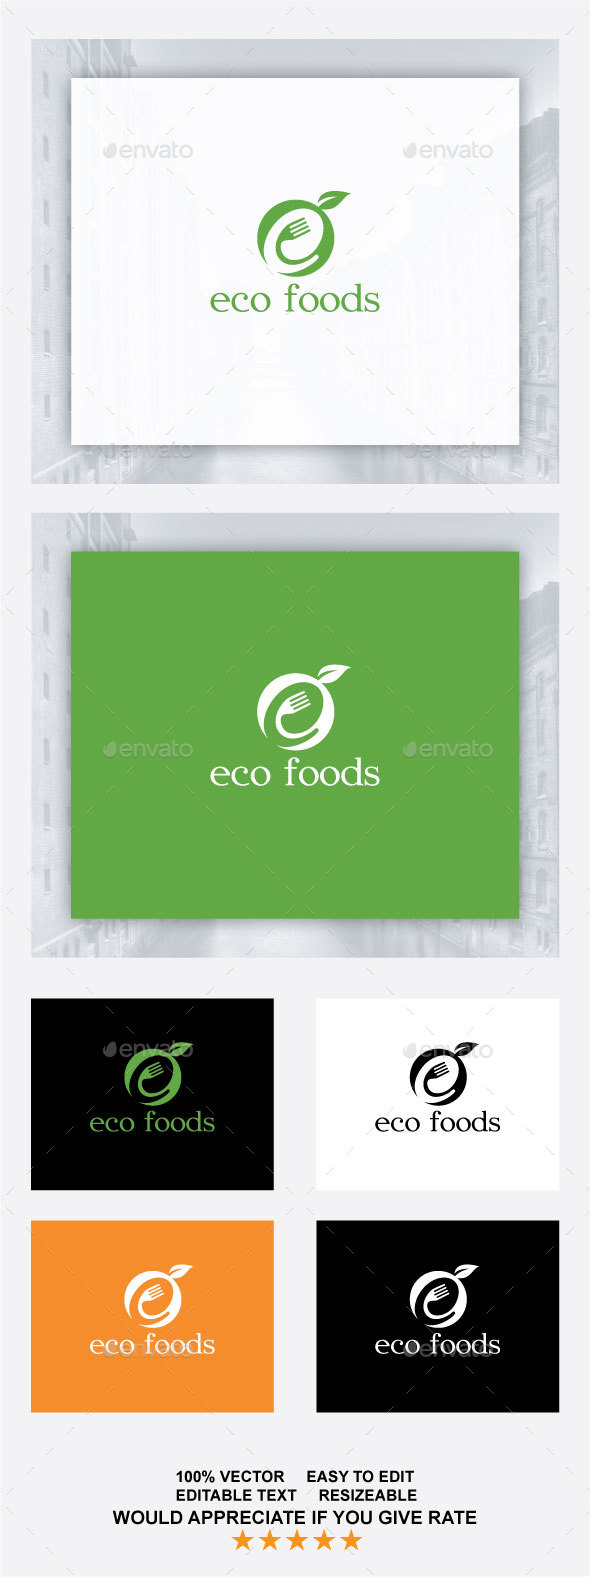 eco foods